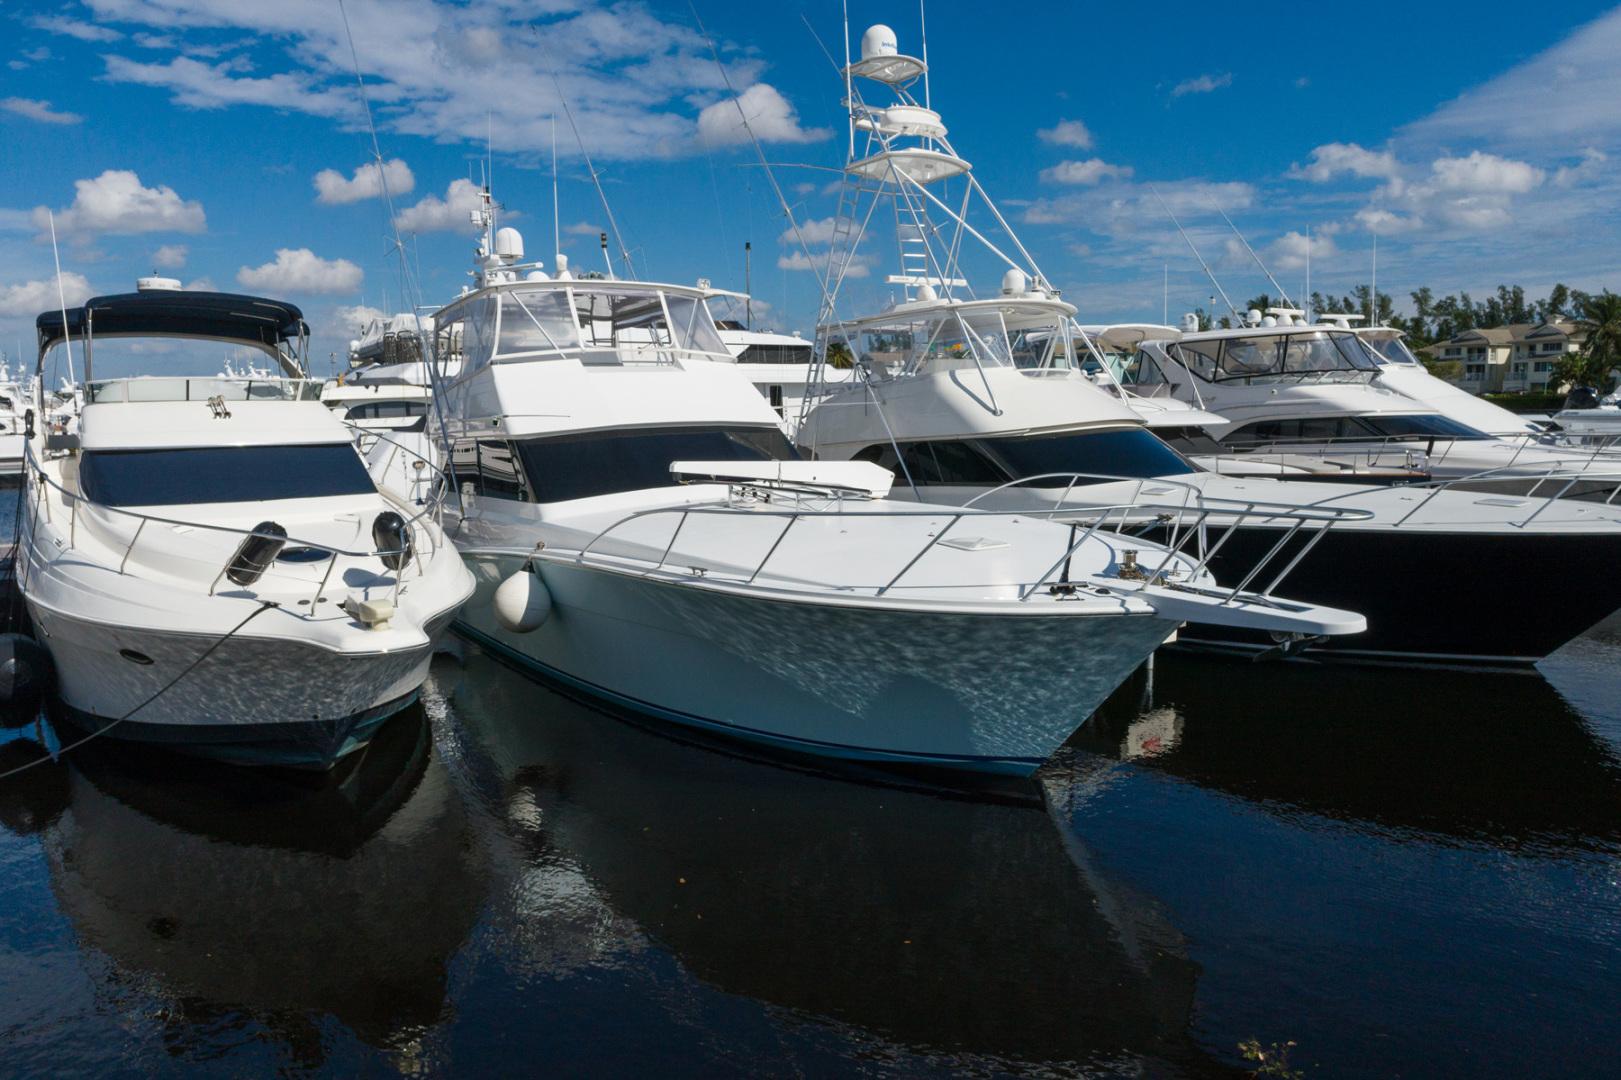 Viking-Convertible 2000-Knotty Girl Fort Lauderdale-Florida-United States-1564789   Thumbnail